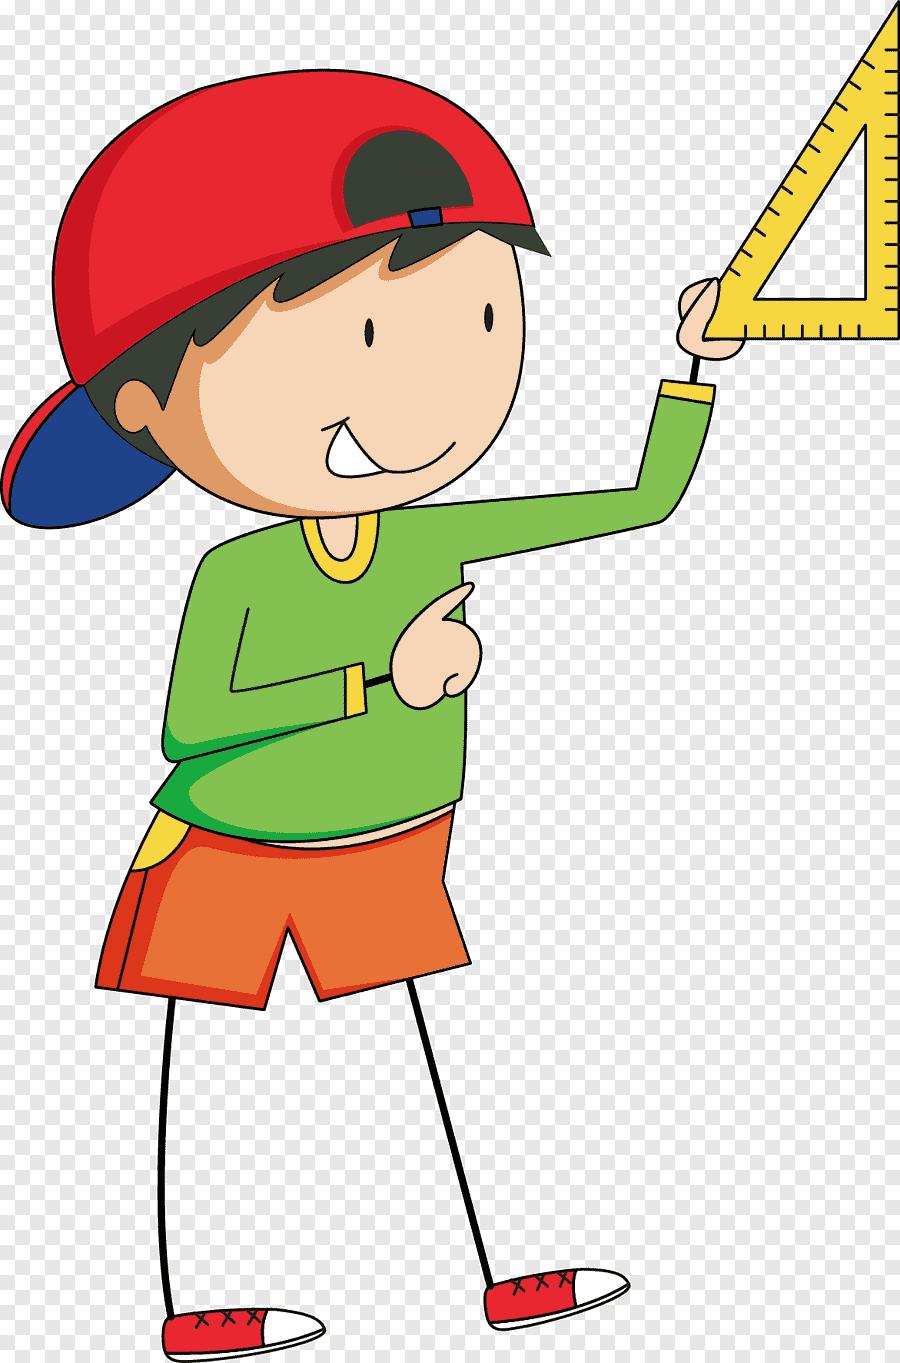 Gambar Kartun Matematika : gambar, kartun, matematika, Ilustrasi, Kartun, Siswa,, Matematika, Laki-laki,, Anak,, Fotografi, PNGEgg